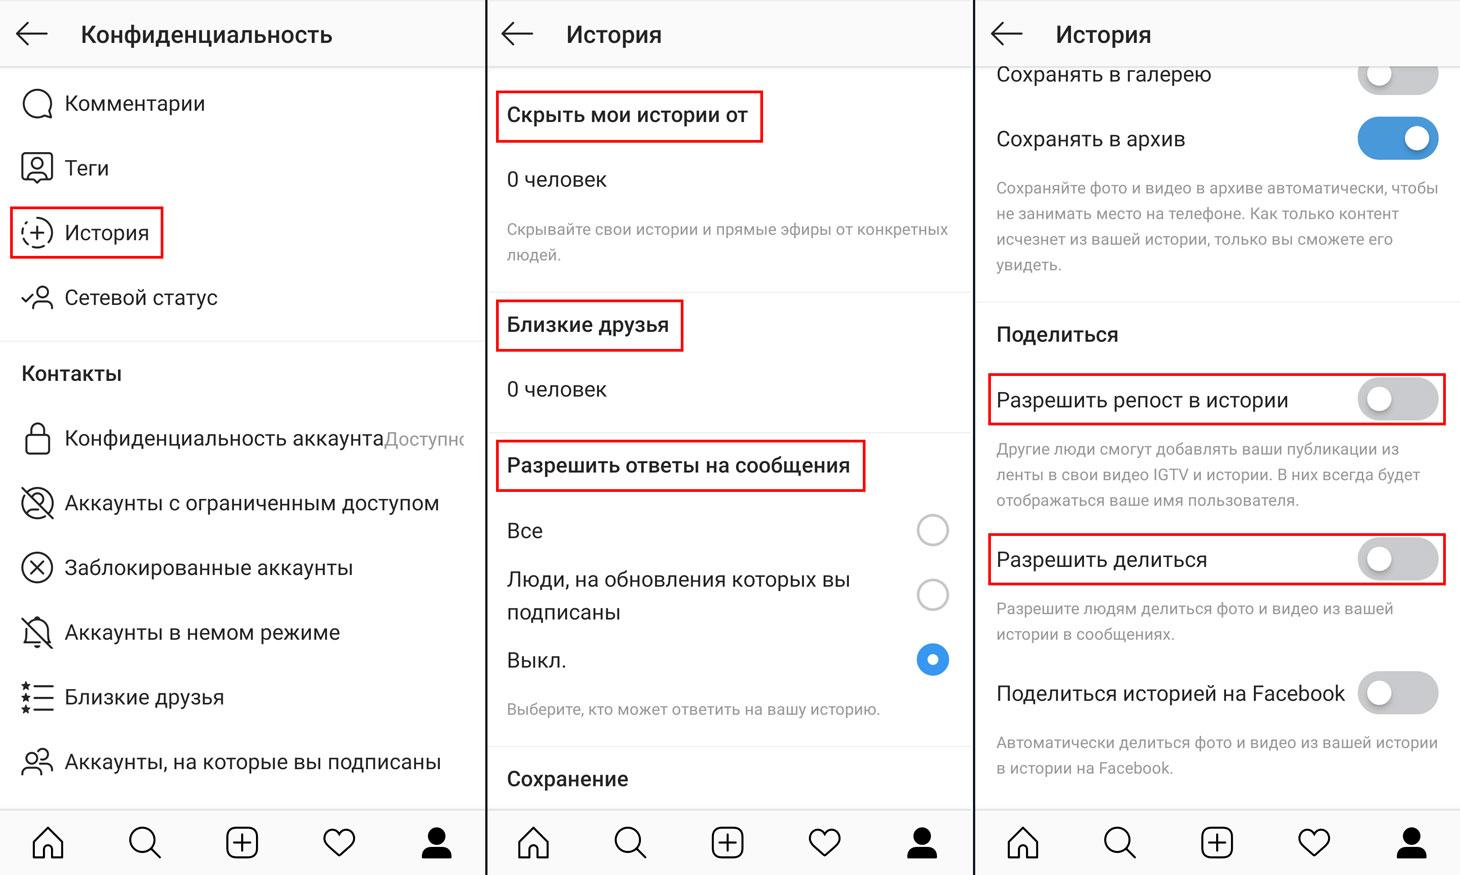 privacy-security-instagram-screen-8.jpg